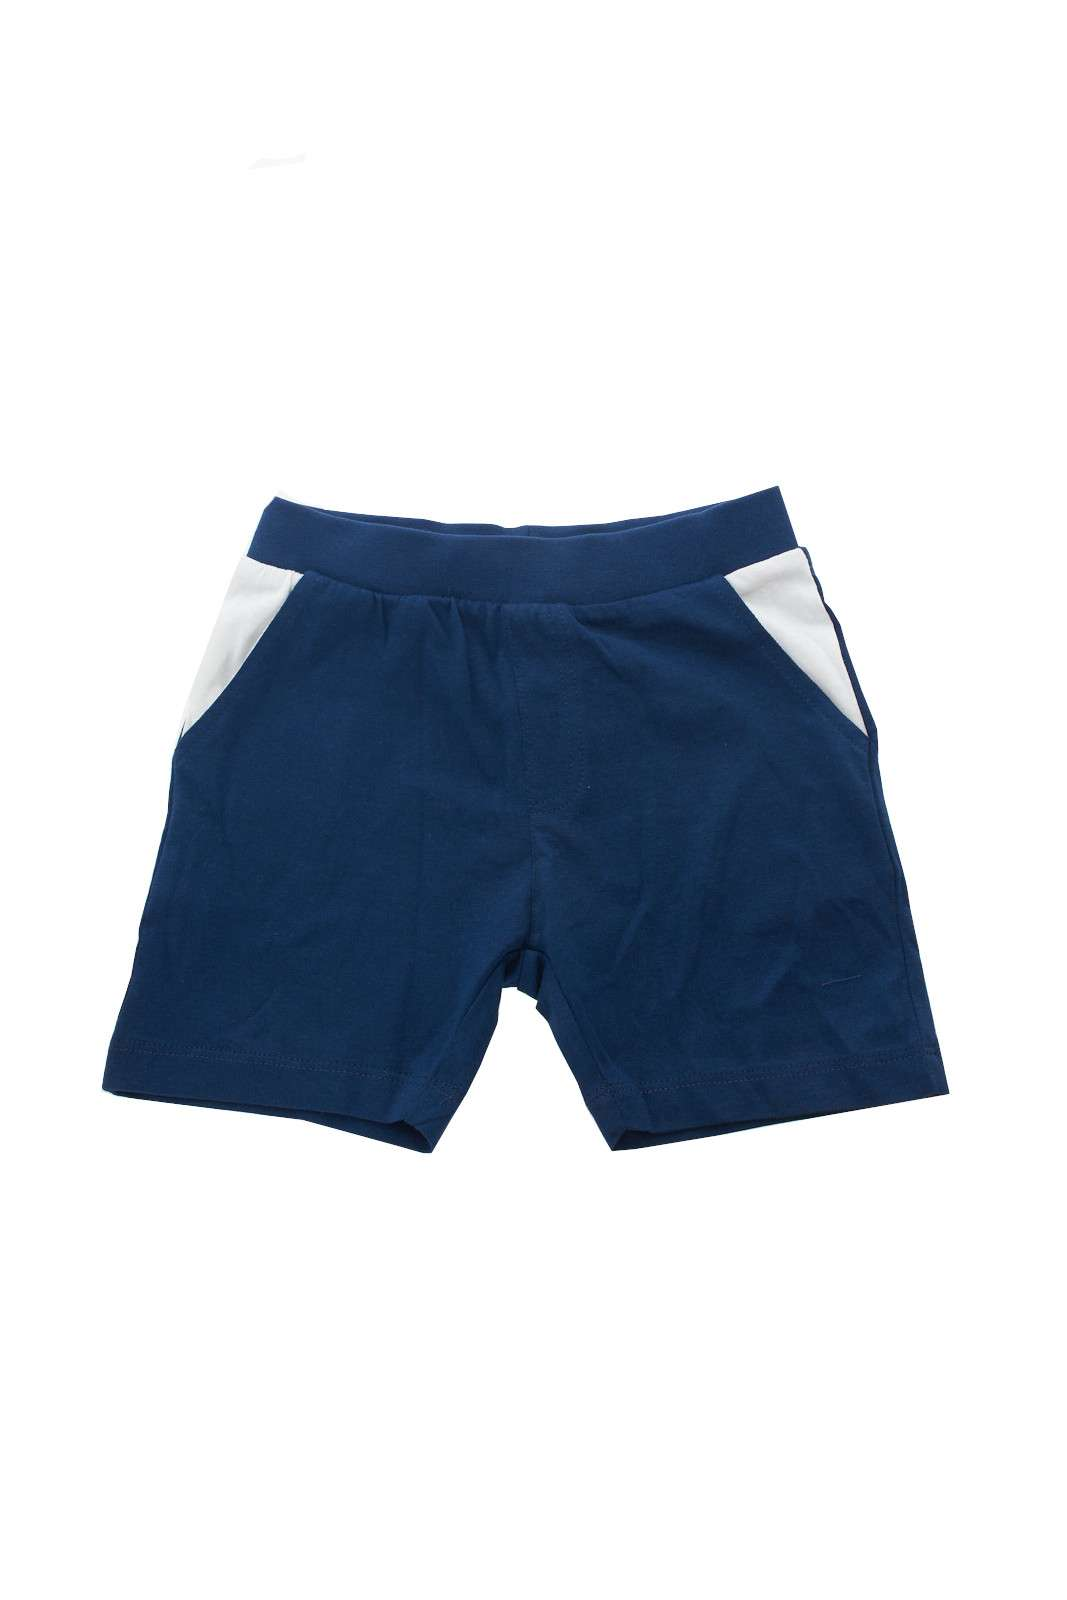 https://www.parmax.com/media/catalog/product/a/i/PE-outlet_parmax-pantaloncini-Bambino-Us-Polo-Assn-512074-A.jpg